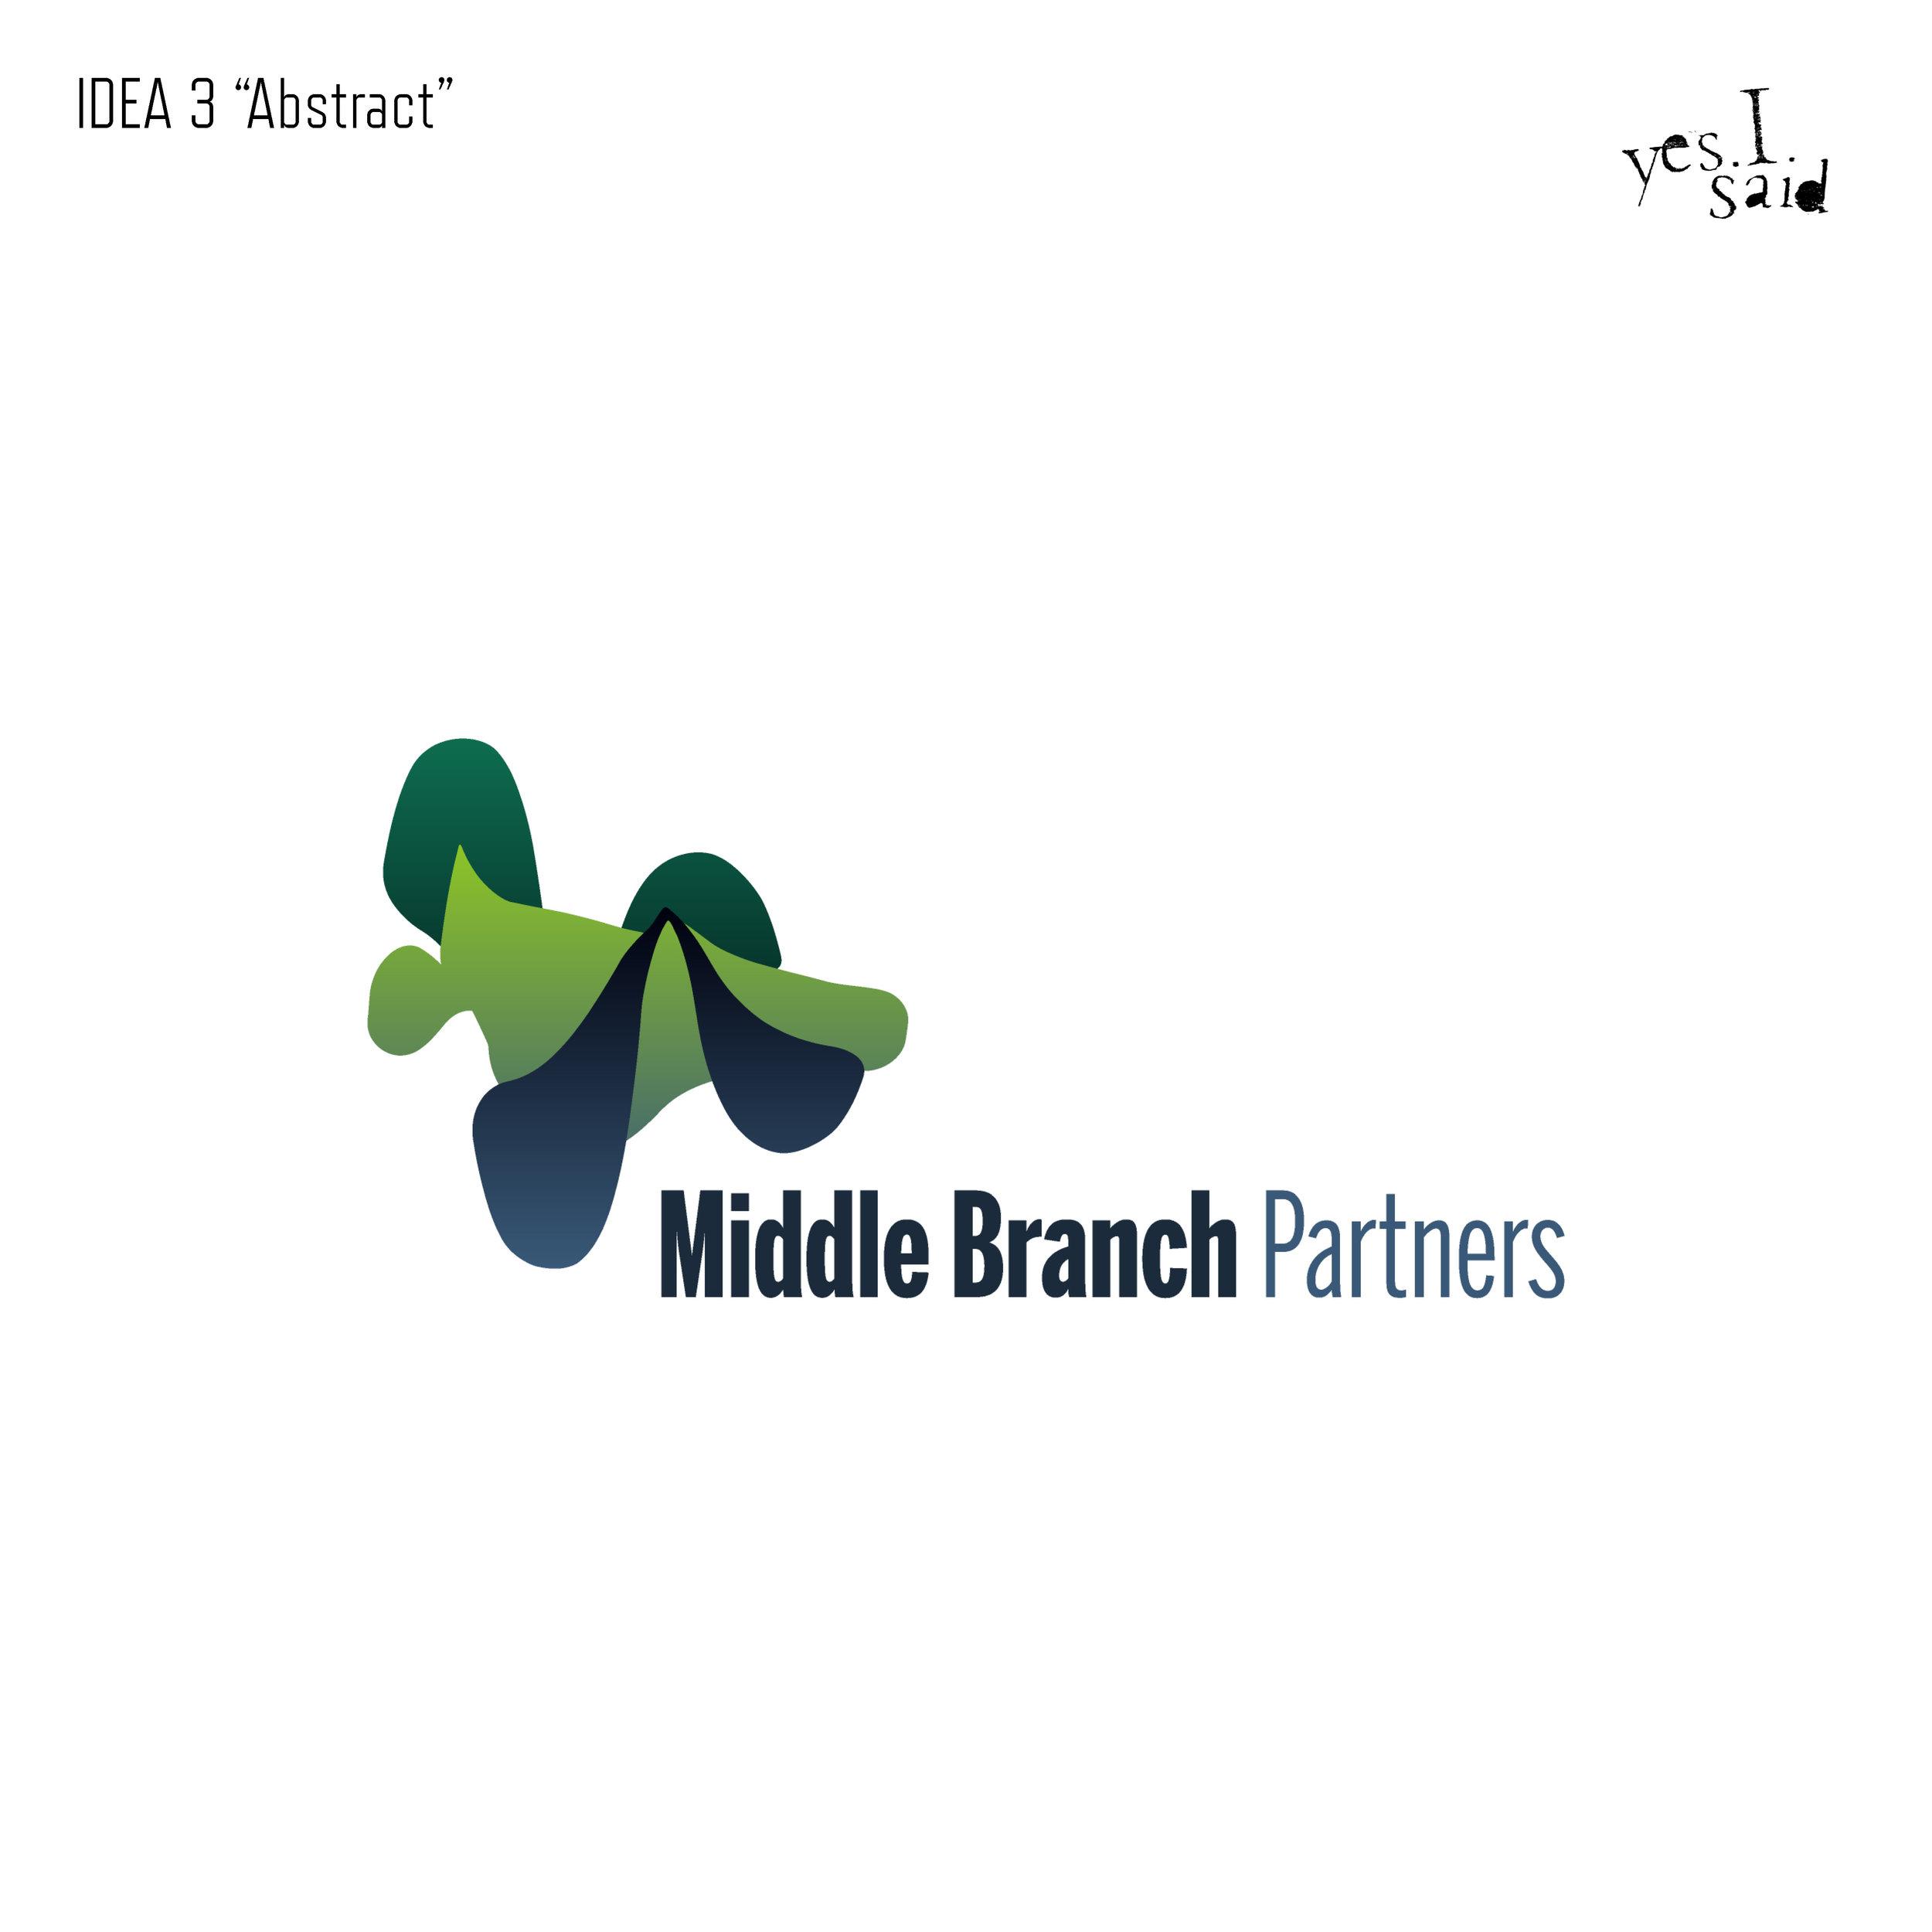 MBP-logoproposal-011119(R)_Page_08.jpg